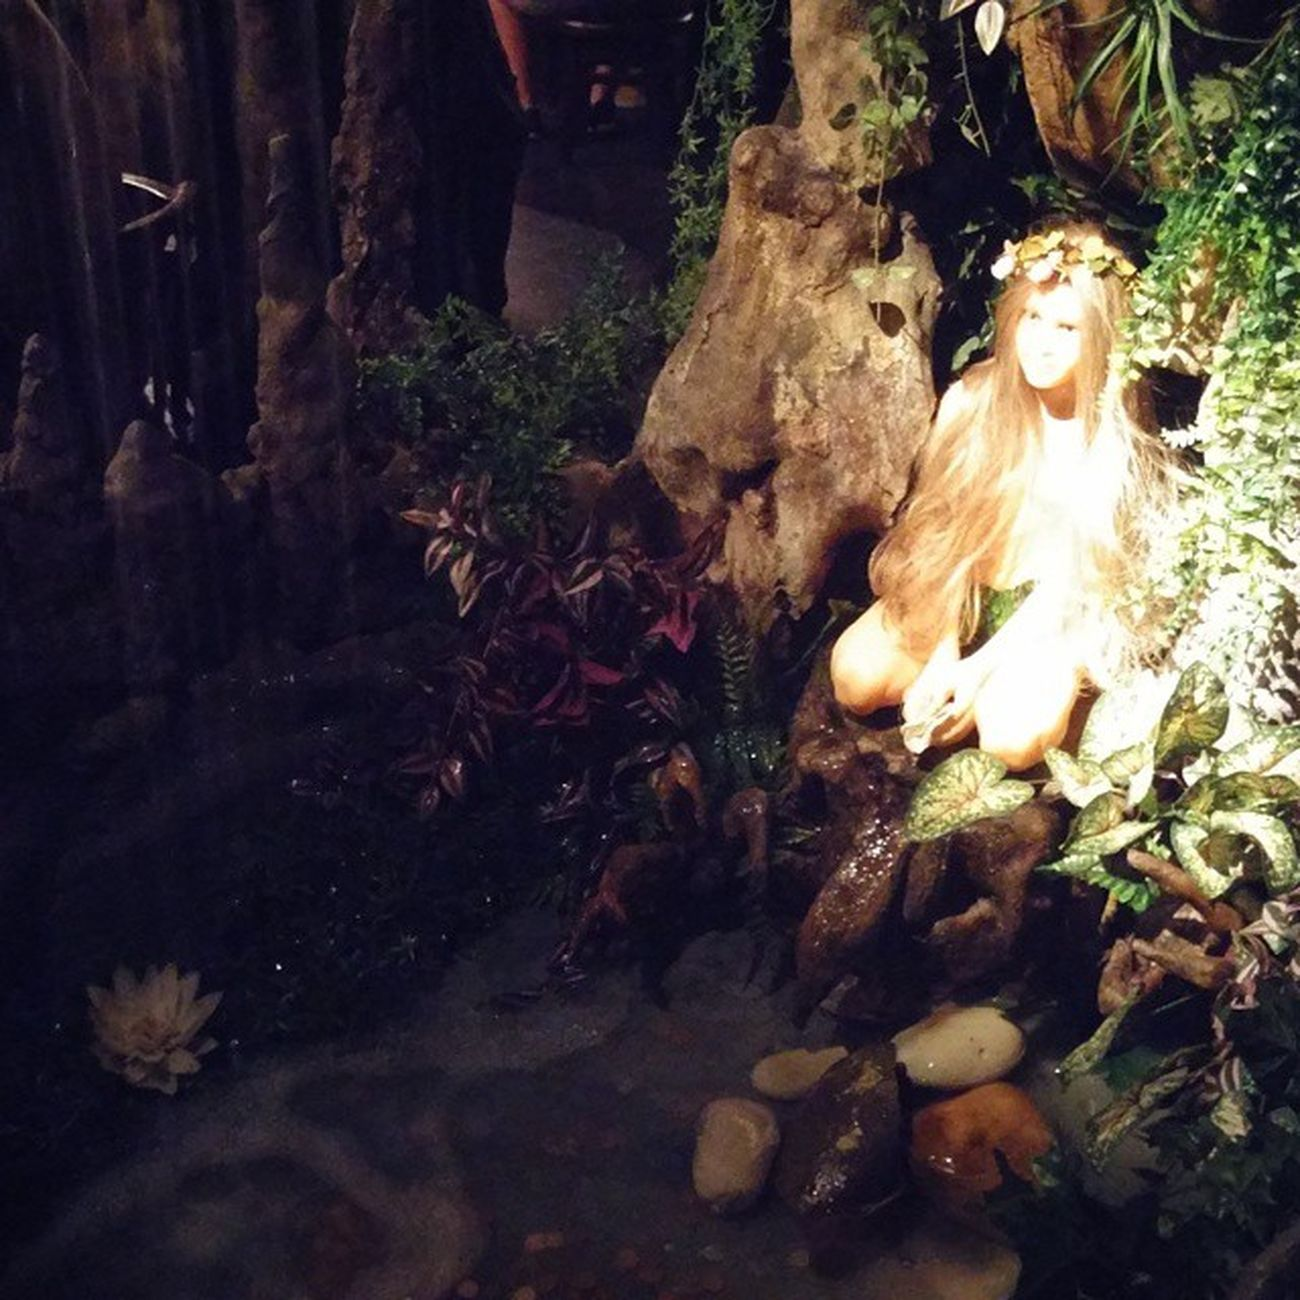 Elboscdelesfades Fairy Fairyforest Keiju Keijumetsä Barcelona Bcnexploradores Bcnexplorers Fairypond